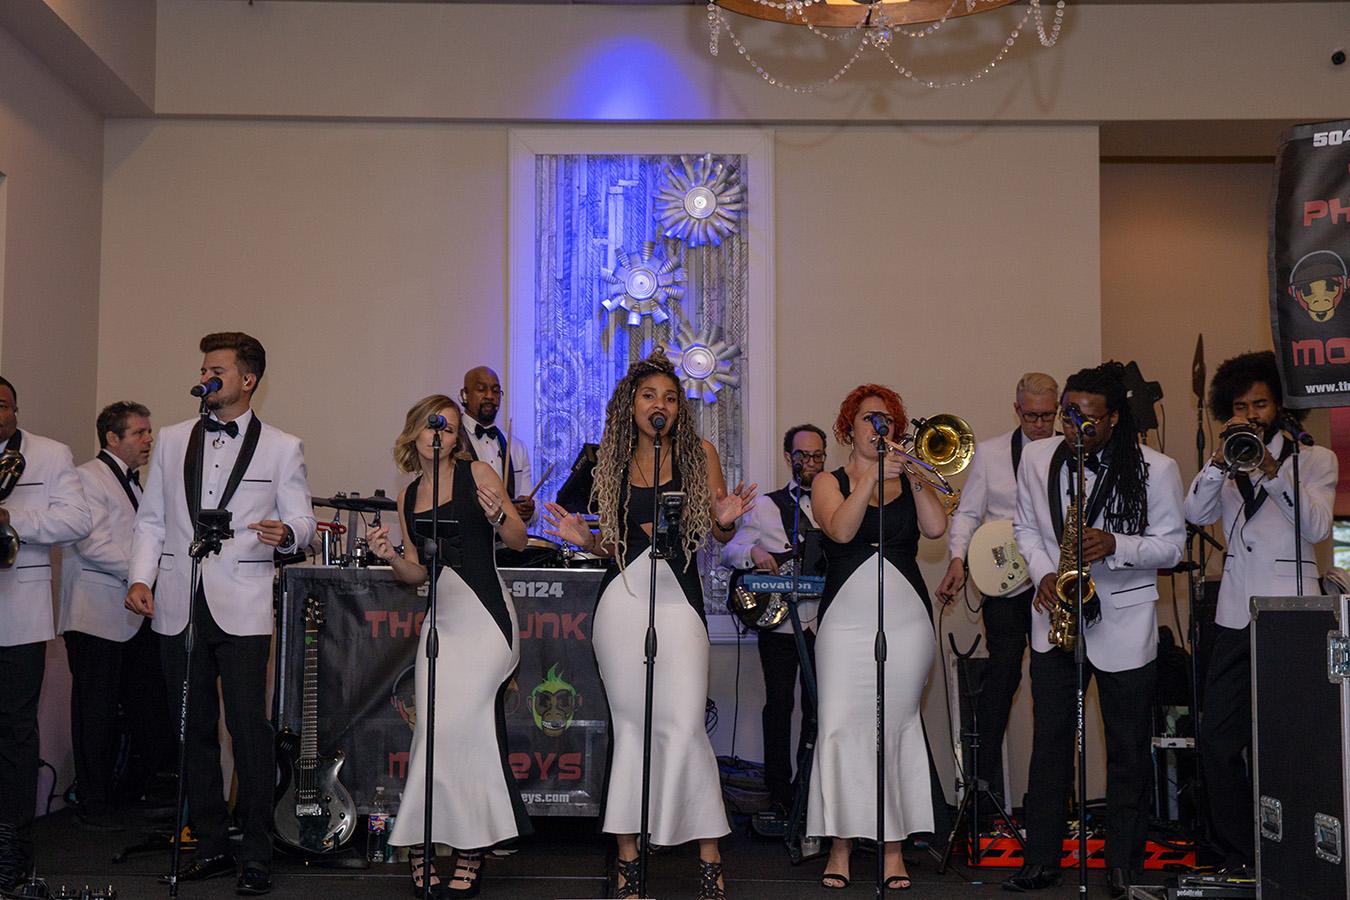 The Phunky Monkeys perform at Bridal Bash | Brian Jarreau Photography